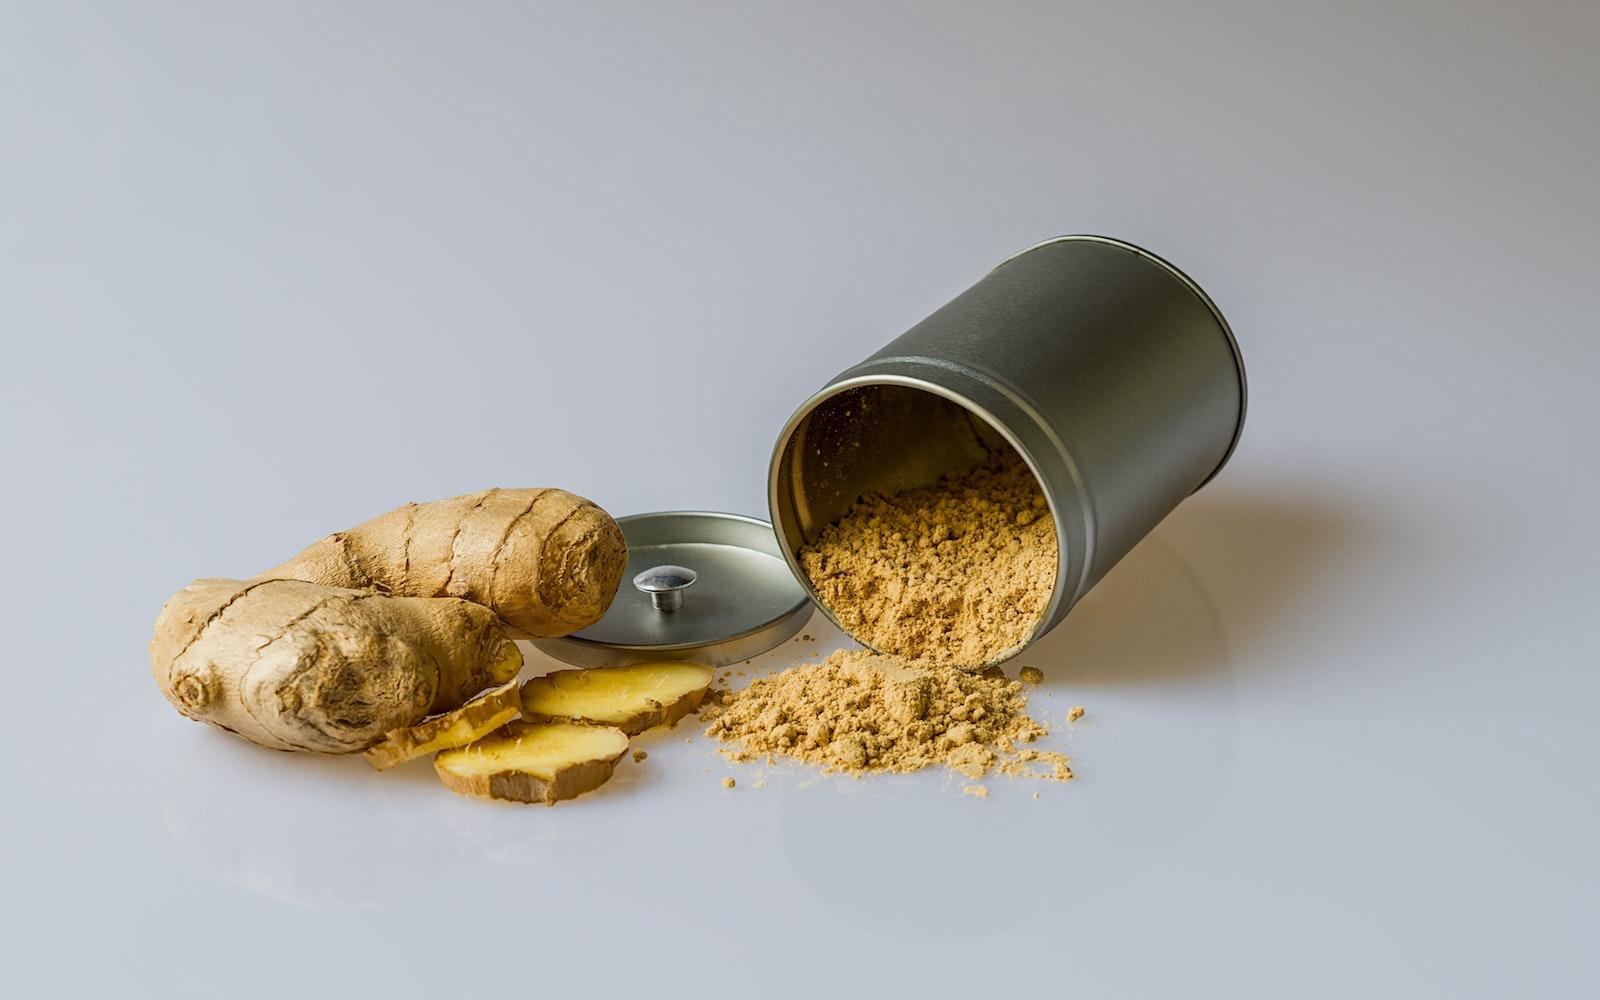 ginger and tumeric powder